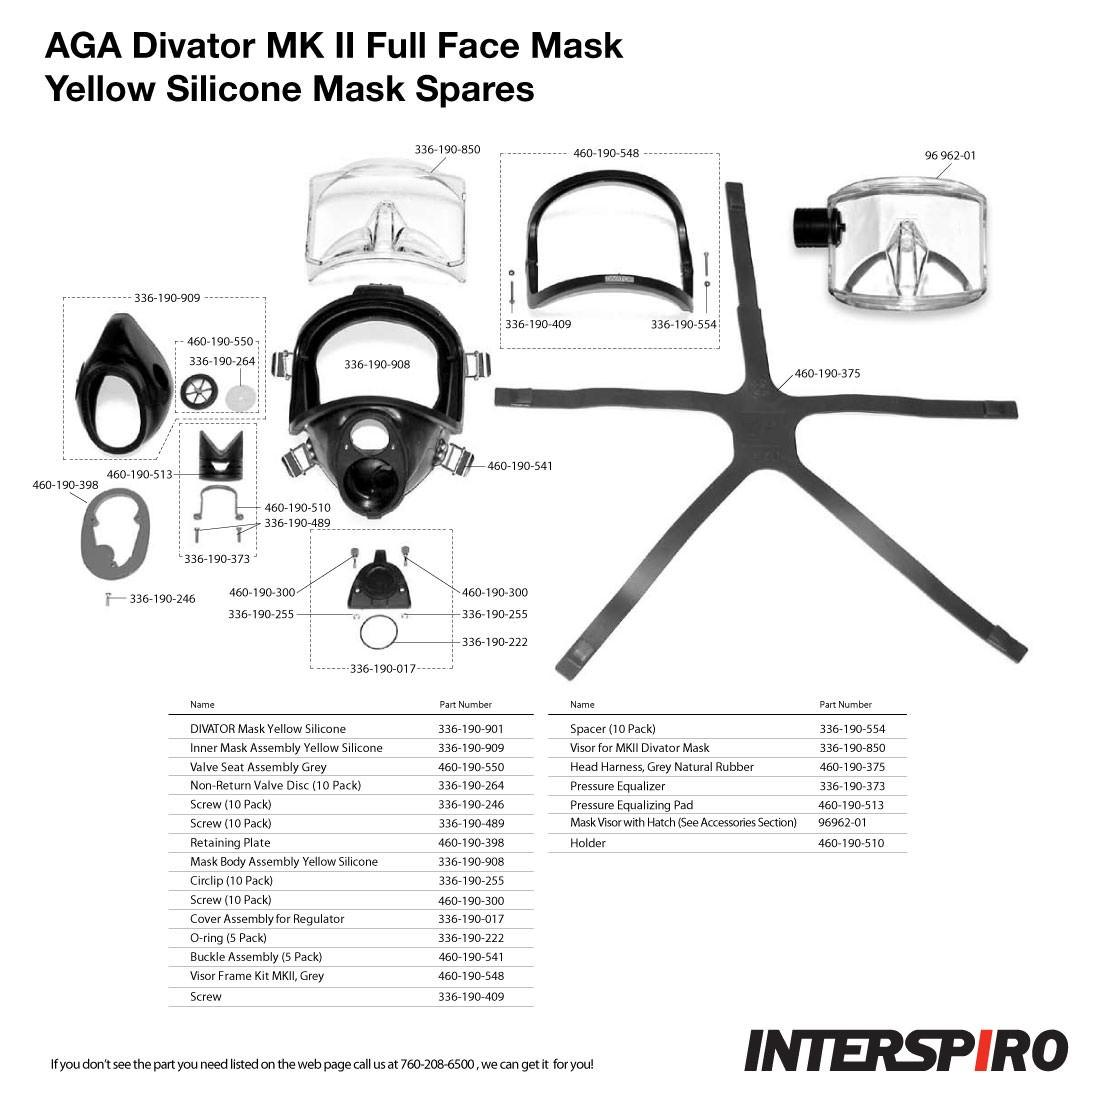 Interspiro AGA Divator MK II Full Face Mask with Demand Regulator - Mask Spares